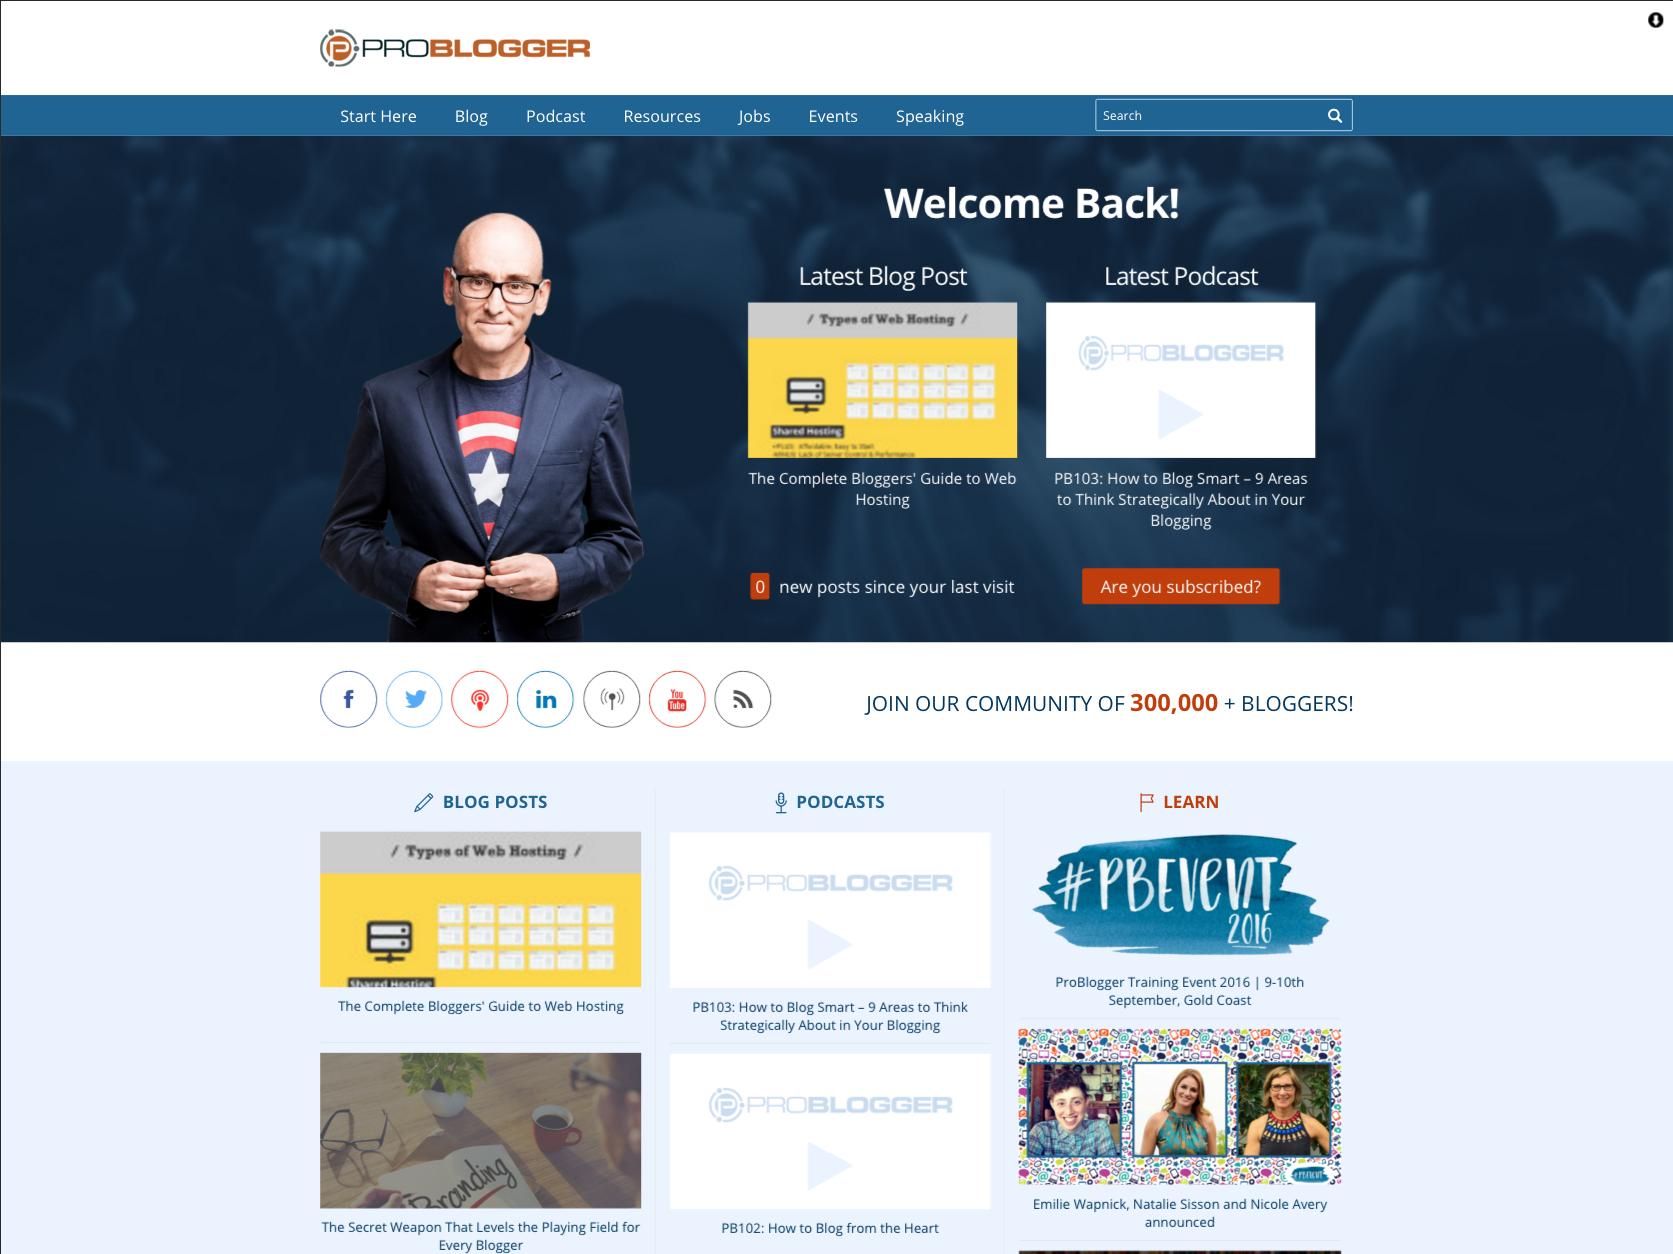 problogger redesign